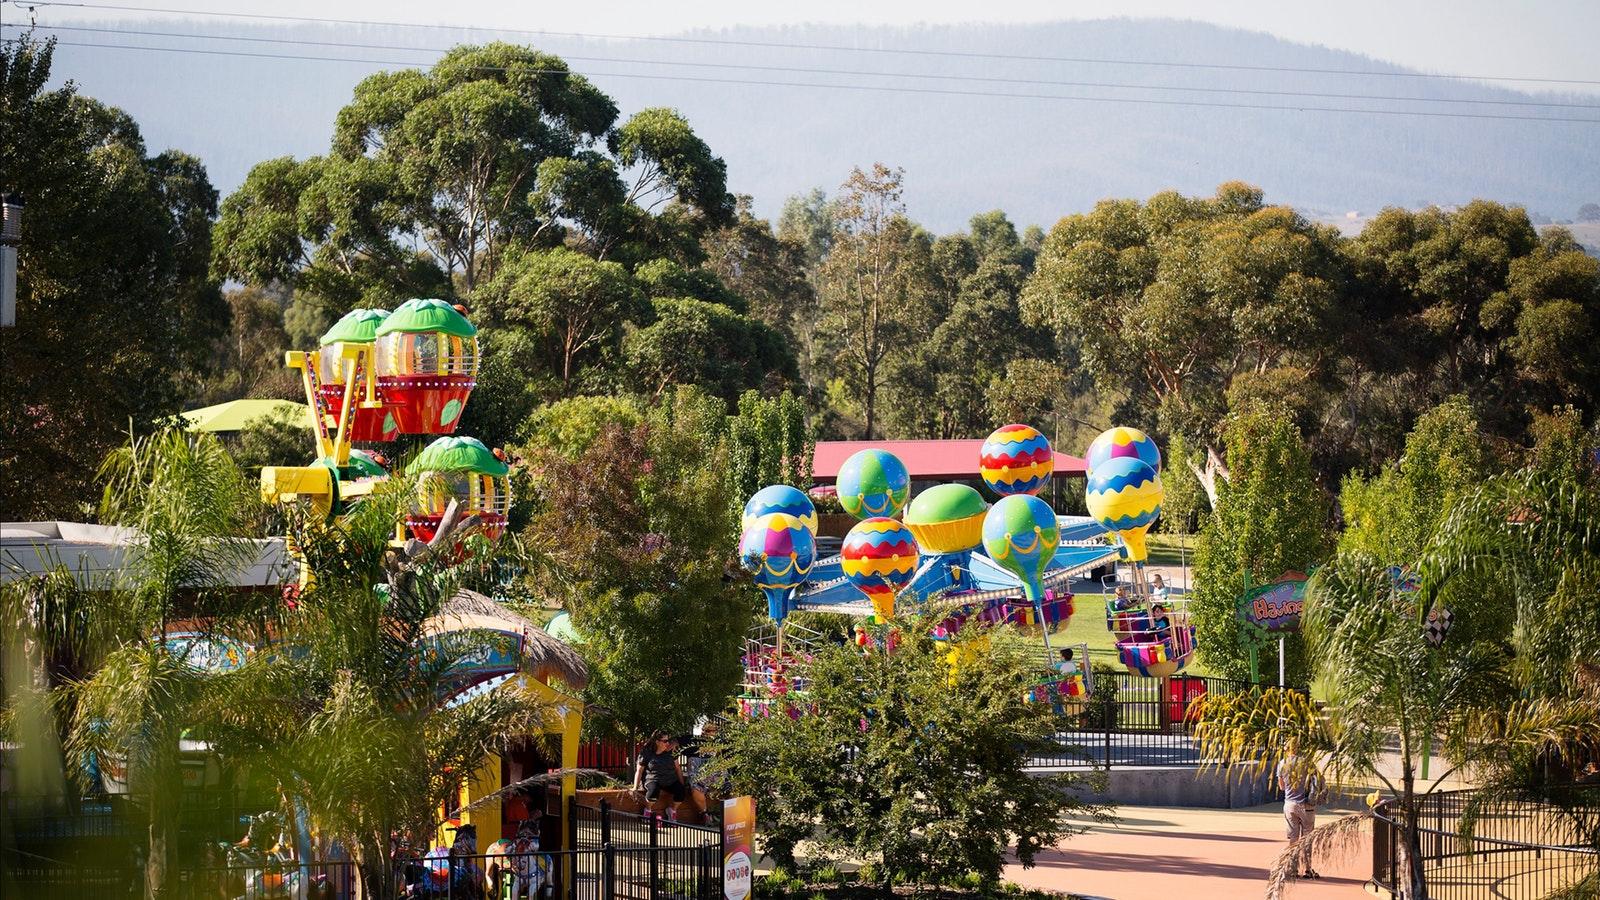 Amusement rides at Funfields